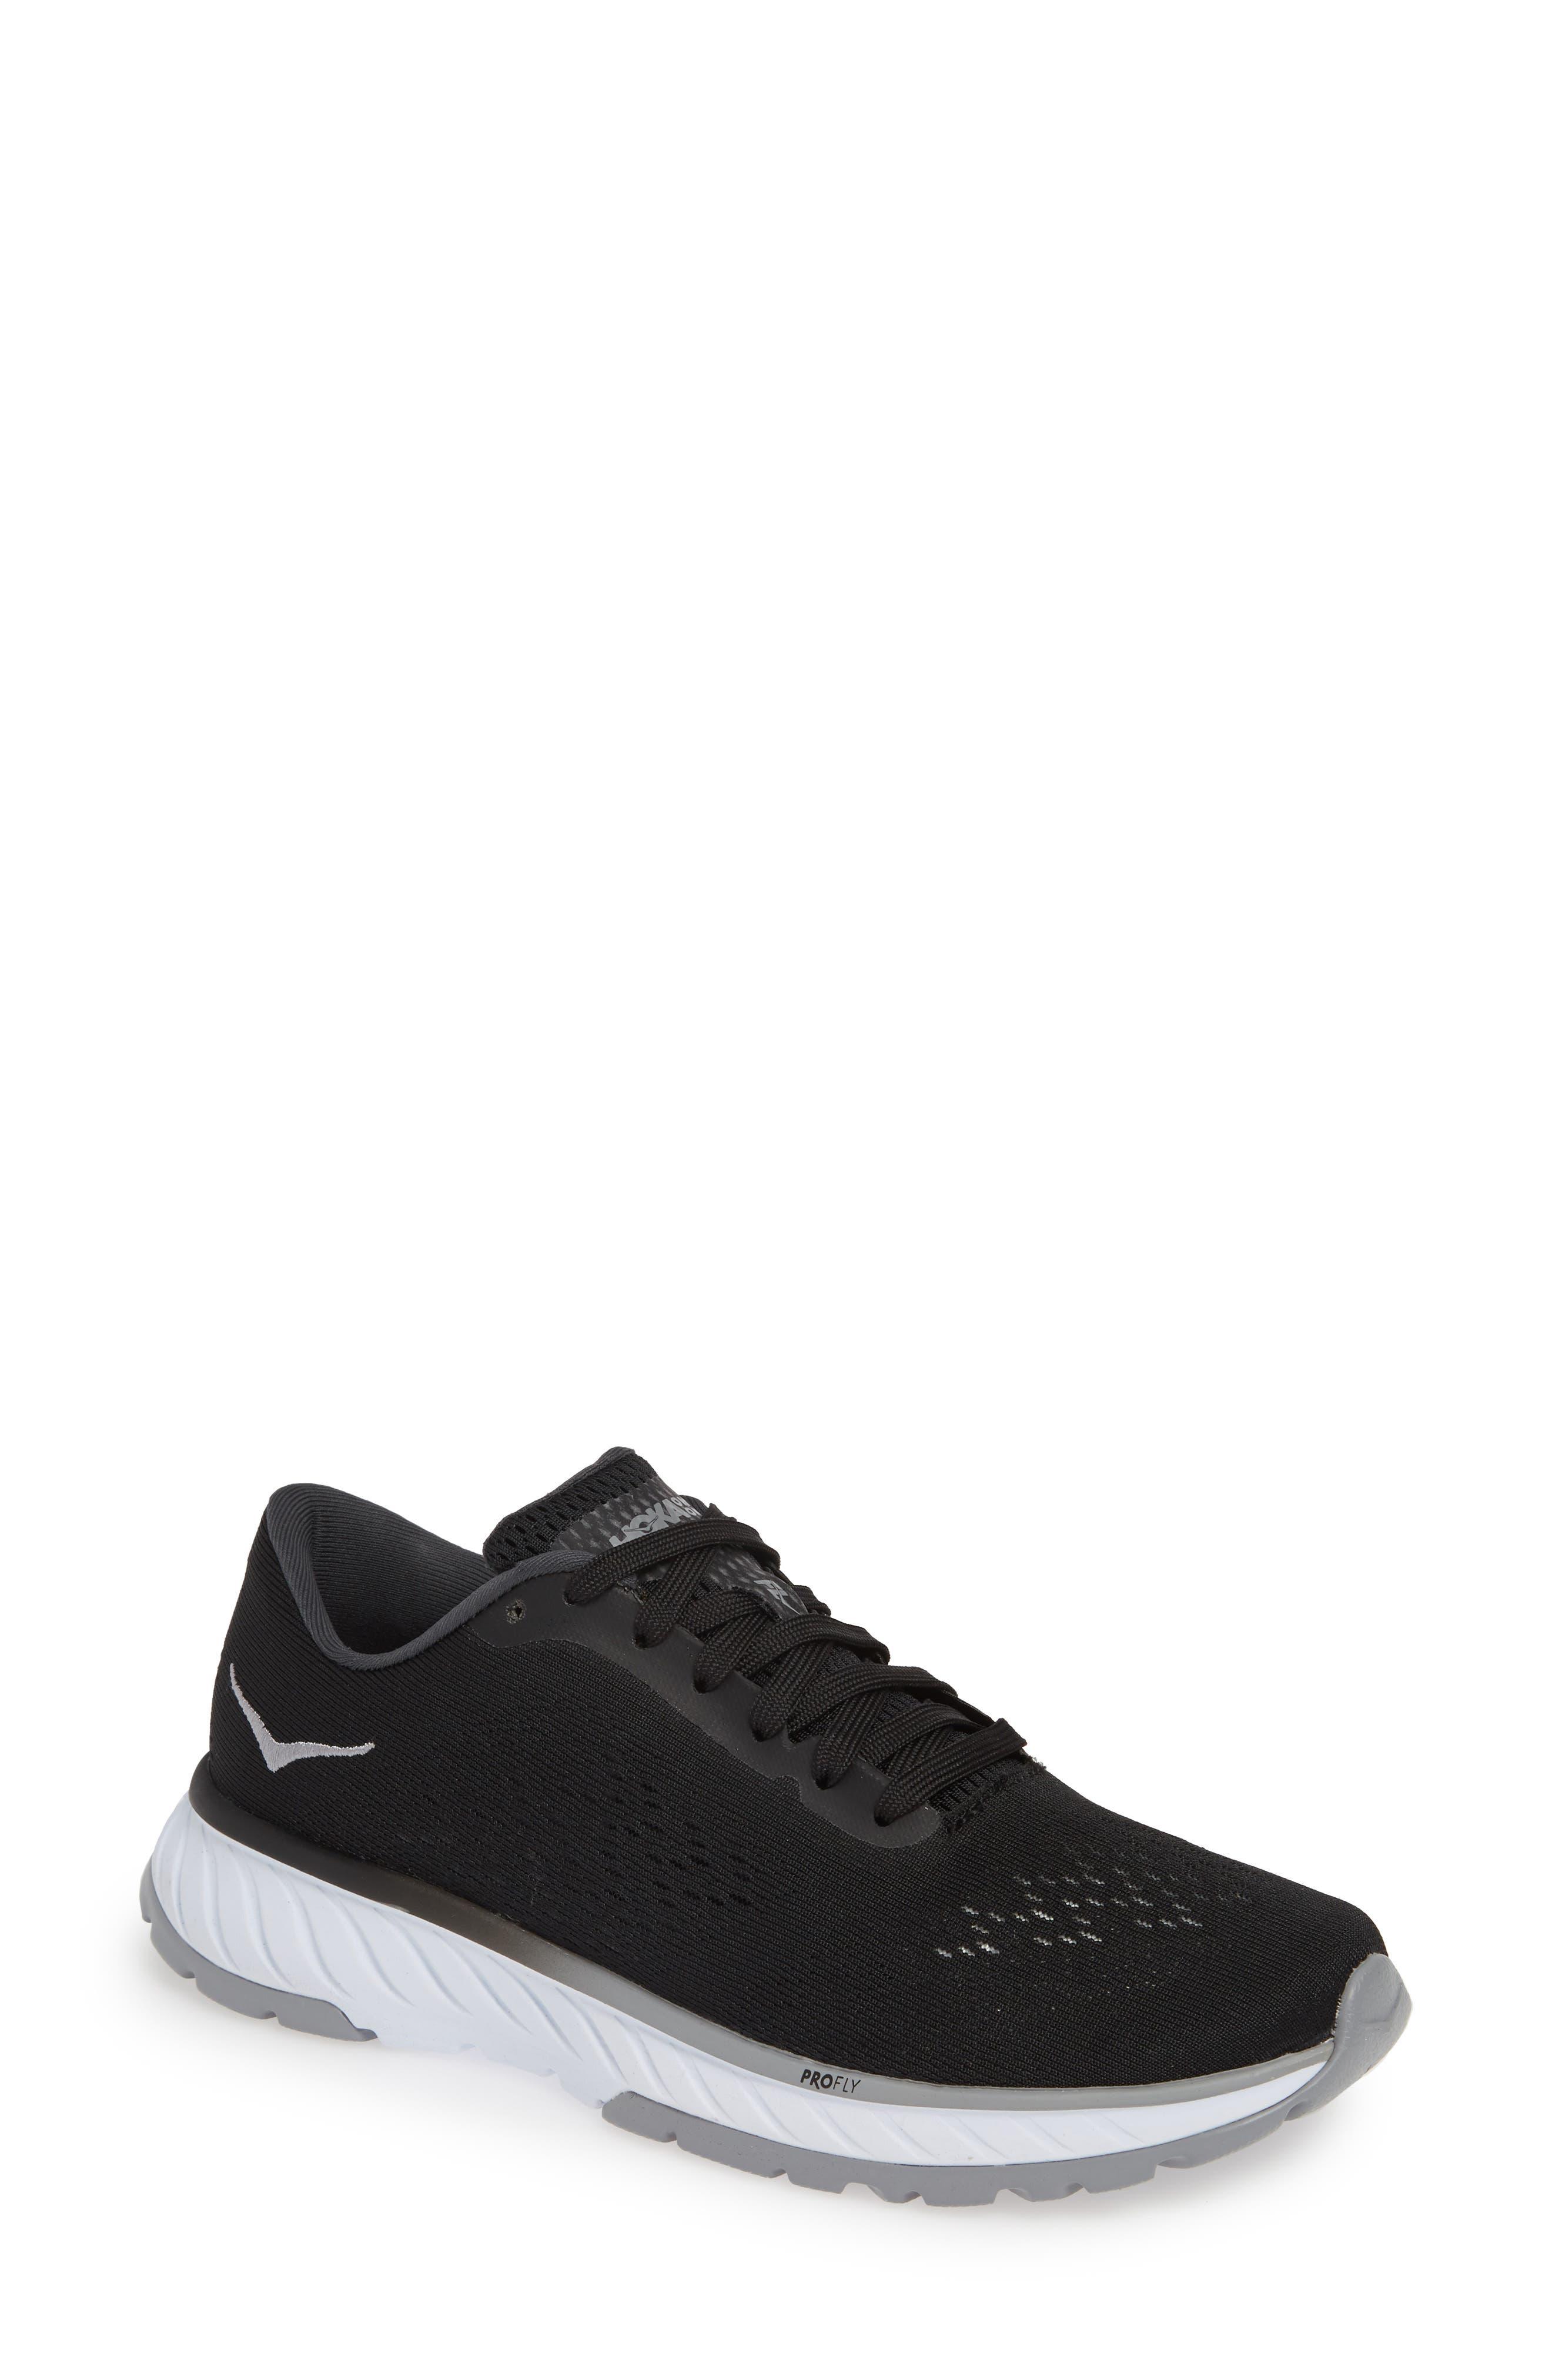 Hoka One One Cavu 2 Running Shoe- Black